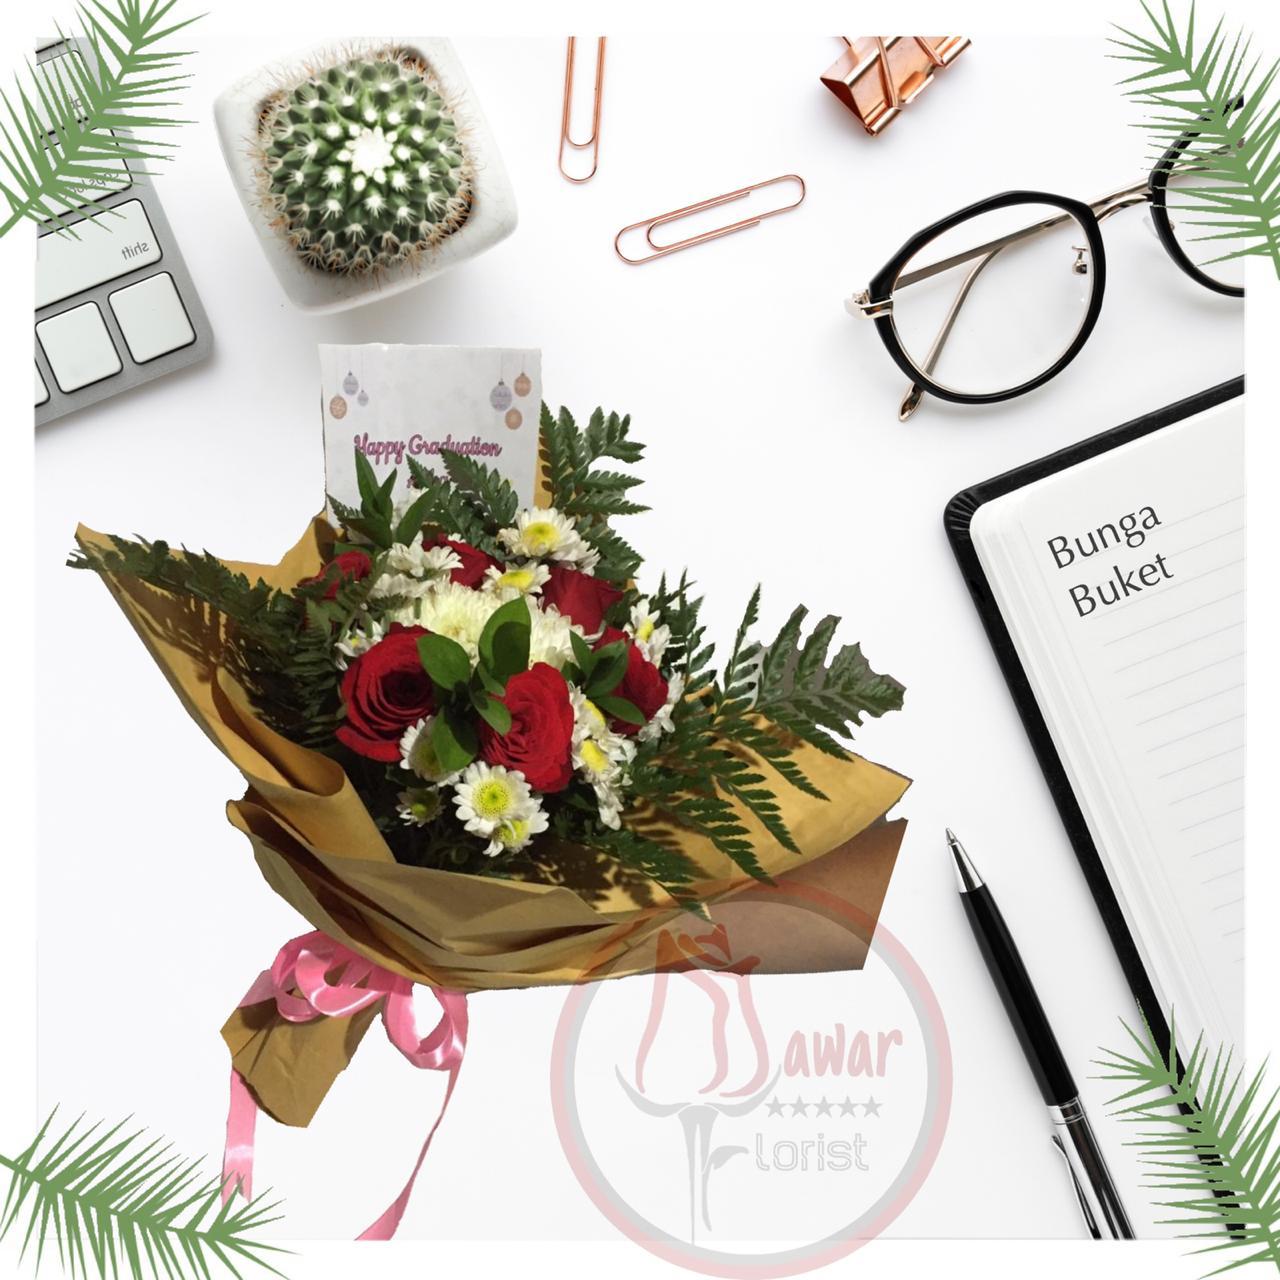 mawarflorist - jual karangan bunga makassar berkualitas dan murah (17)